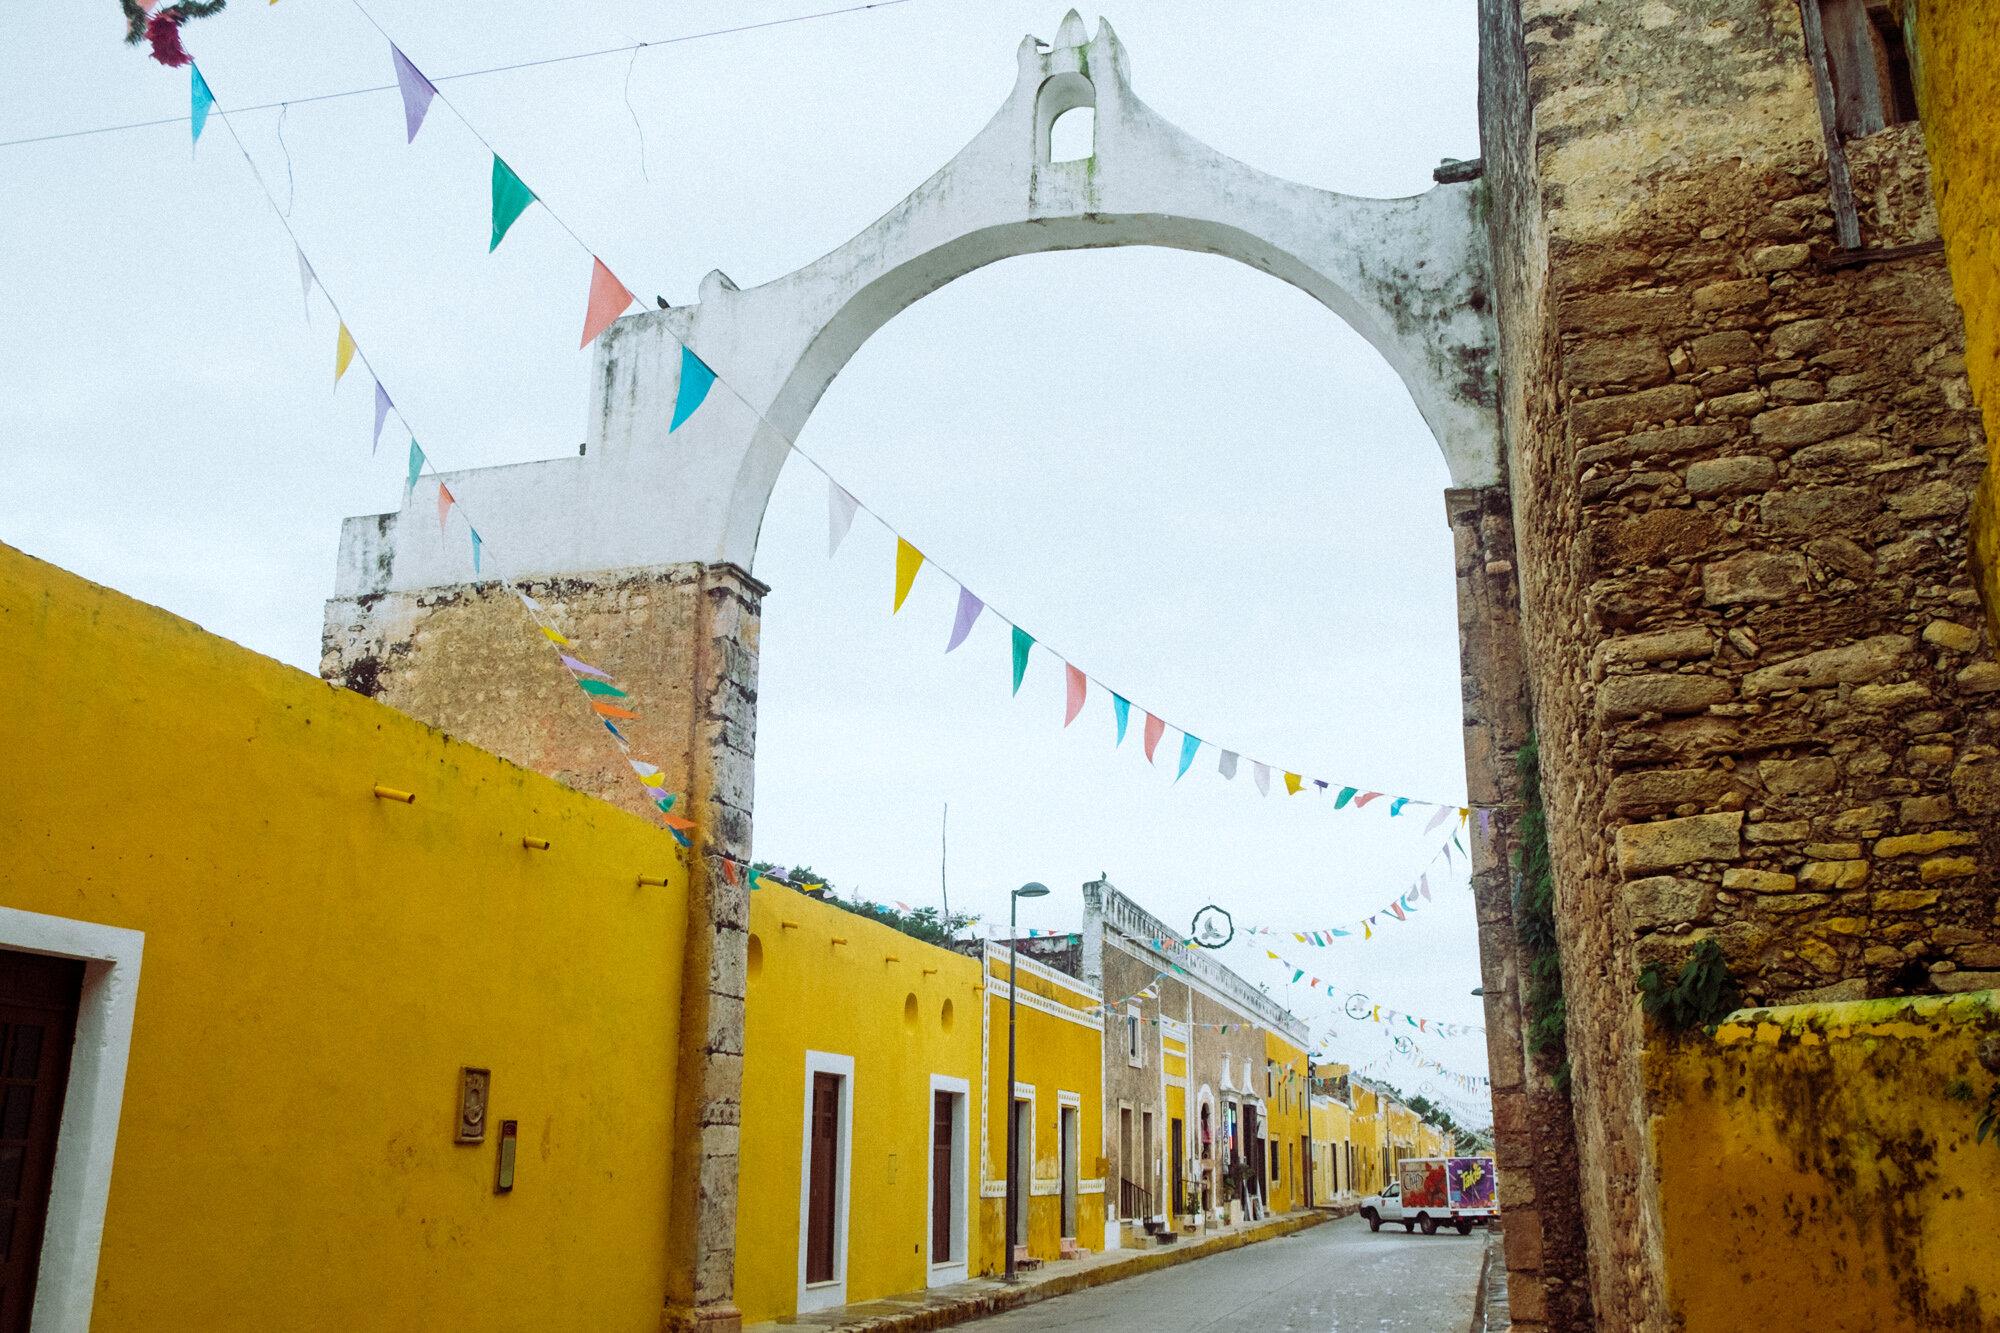 Rachel Off Duty: The Yellow, Cobblestoned Streets of Izamal, Mexico